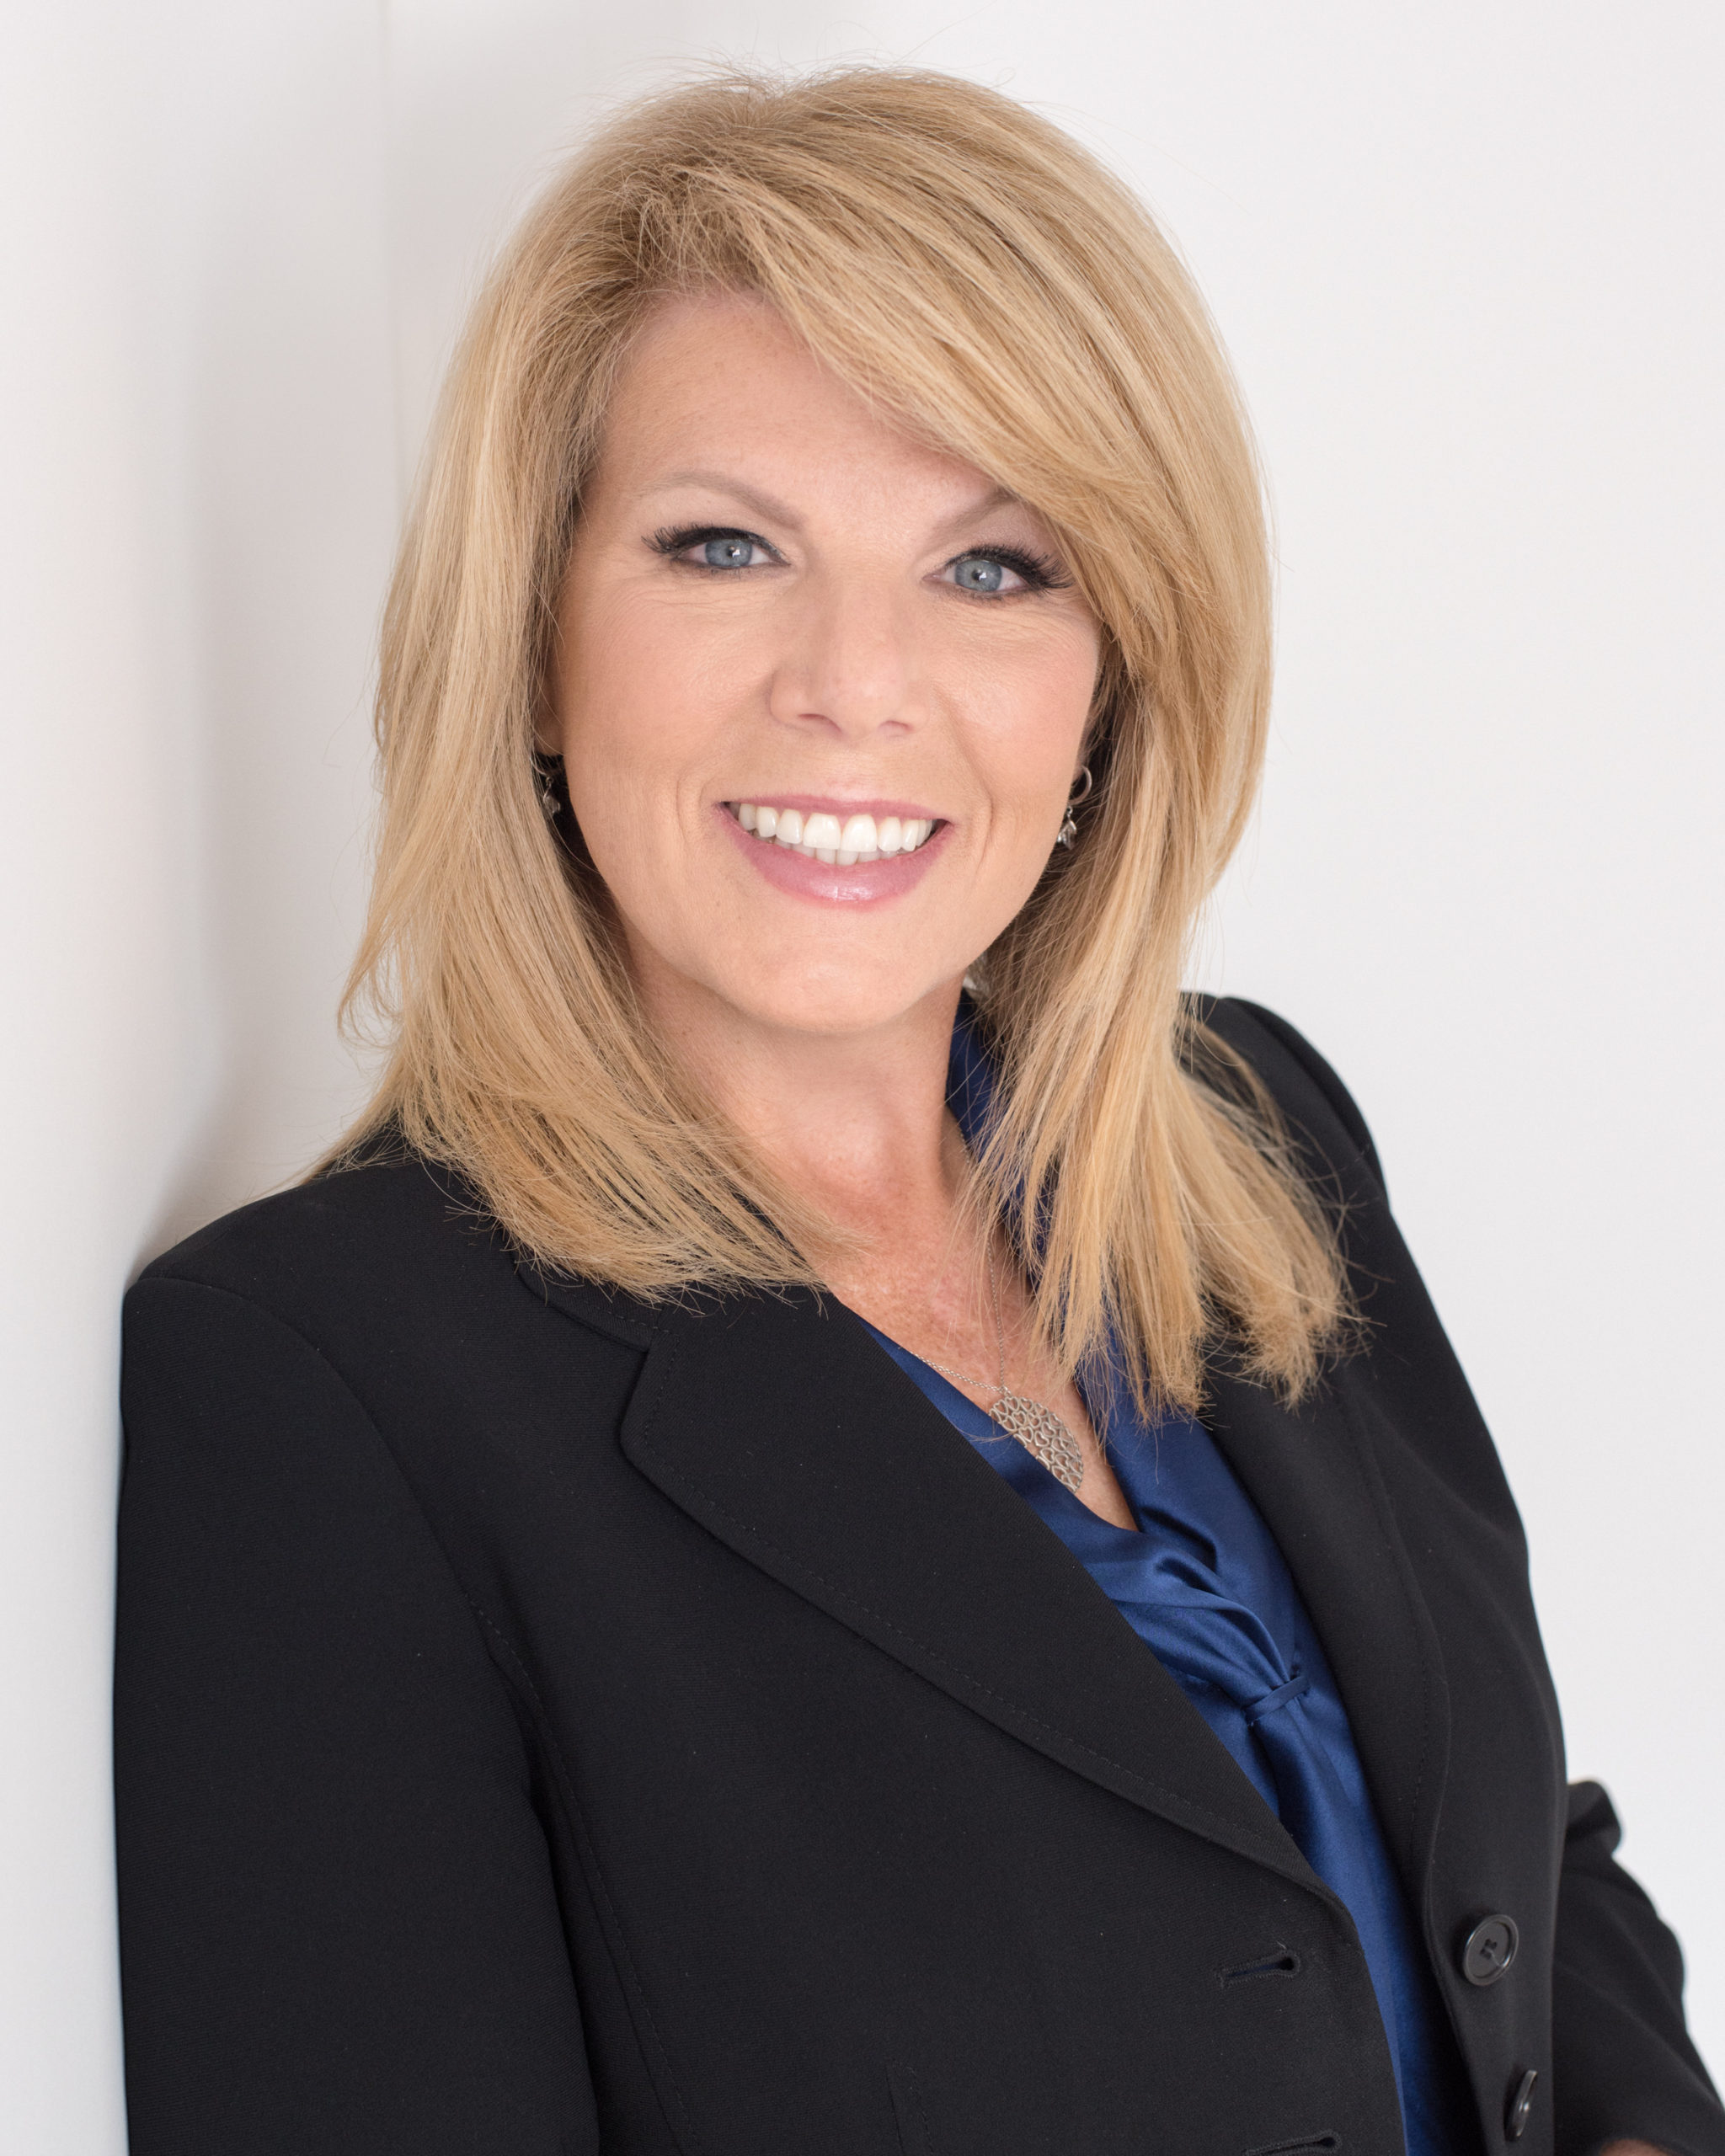 Cindy Ball Wilson